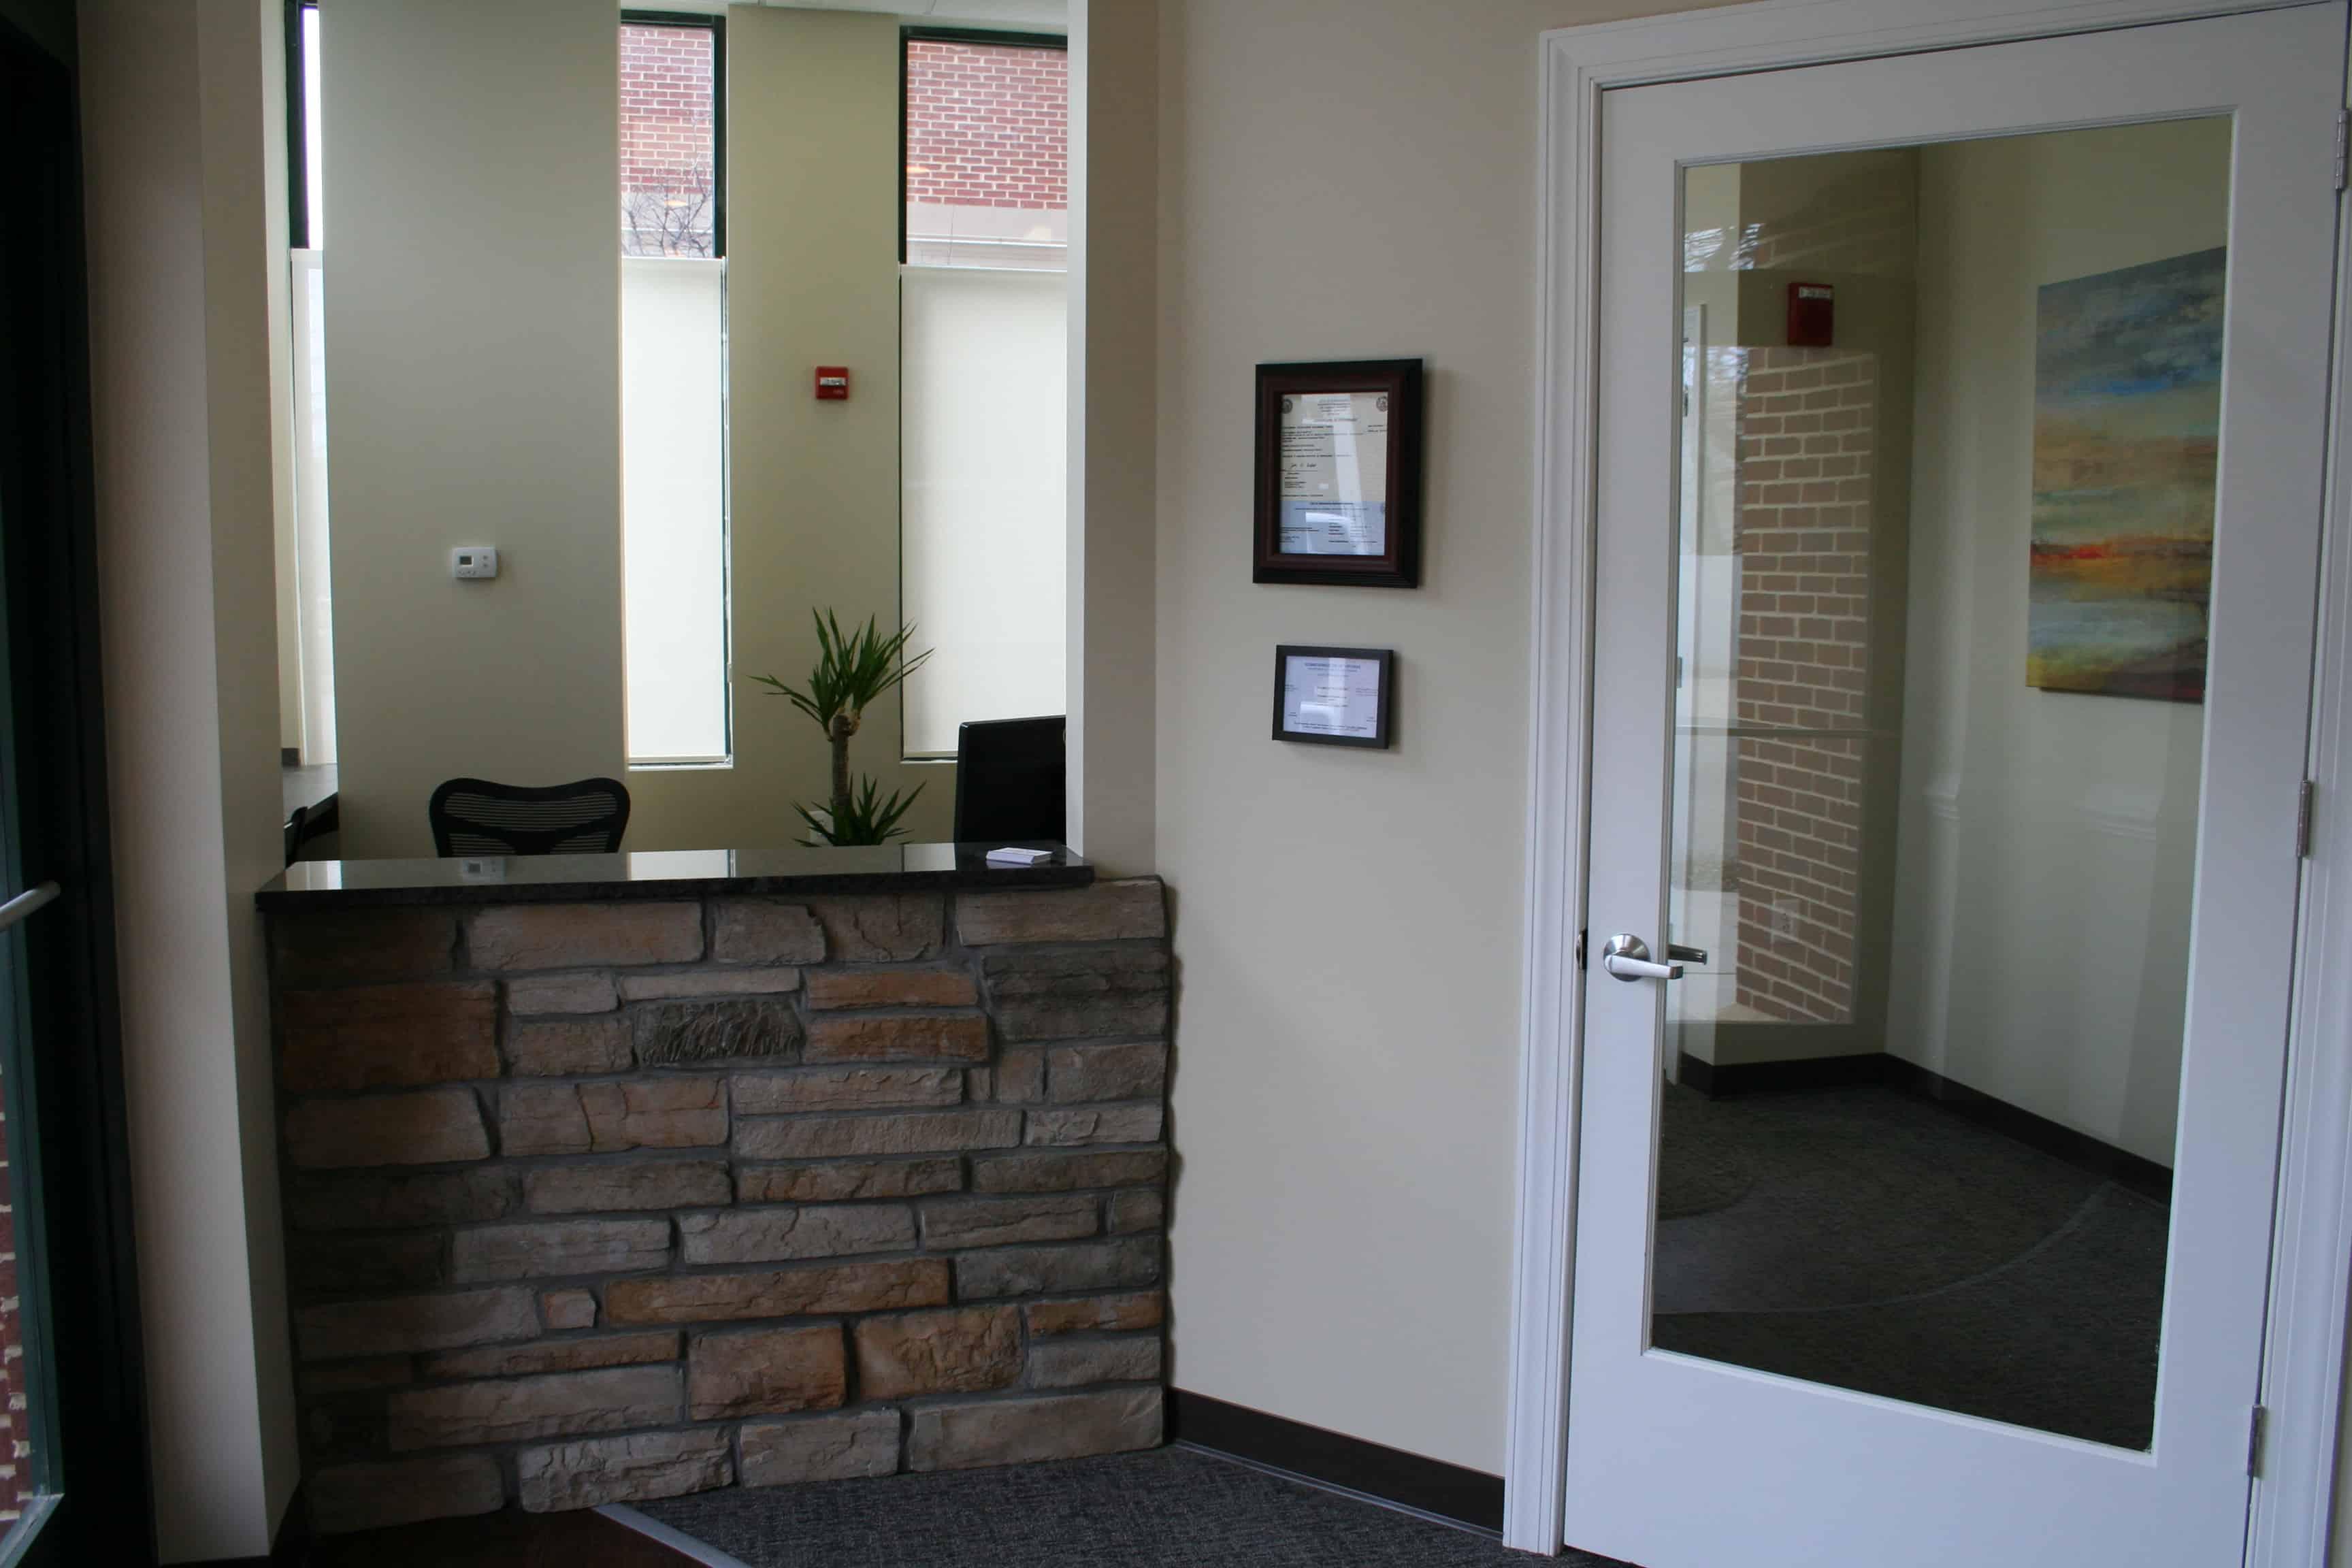 Braddock Dental - Reception Desk